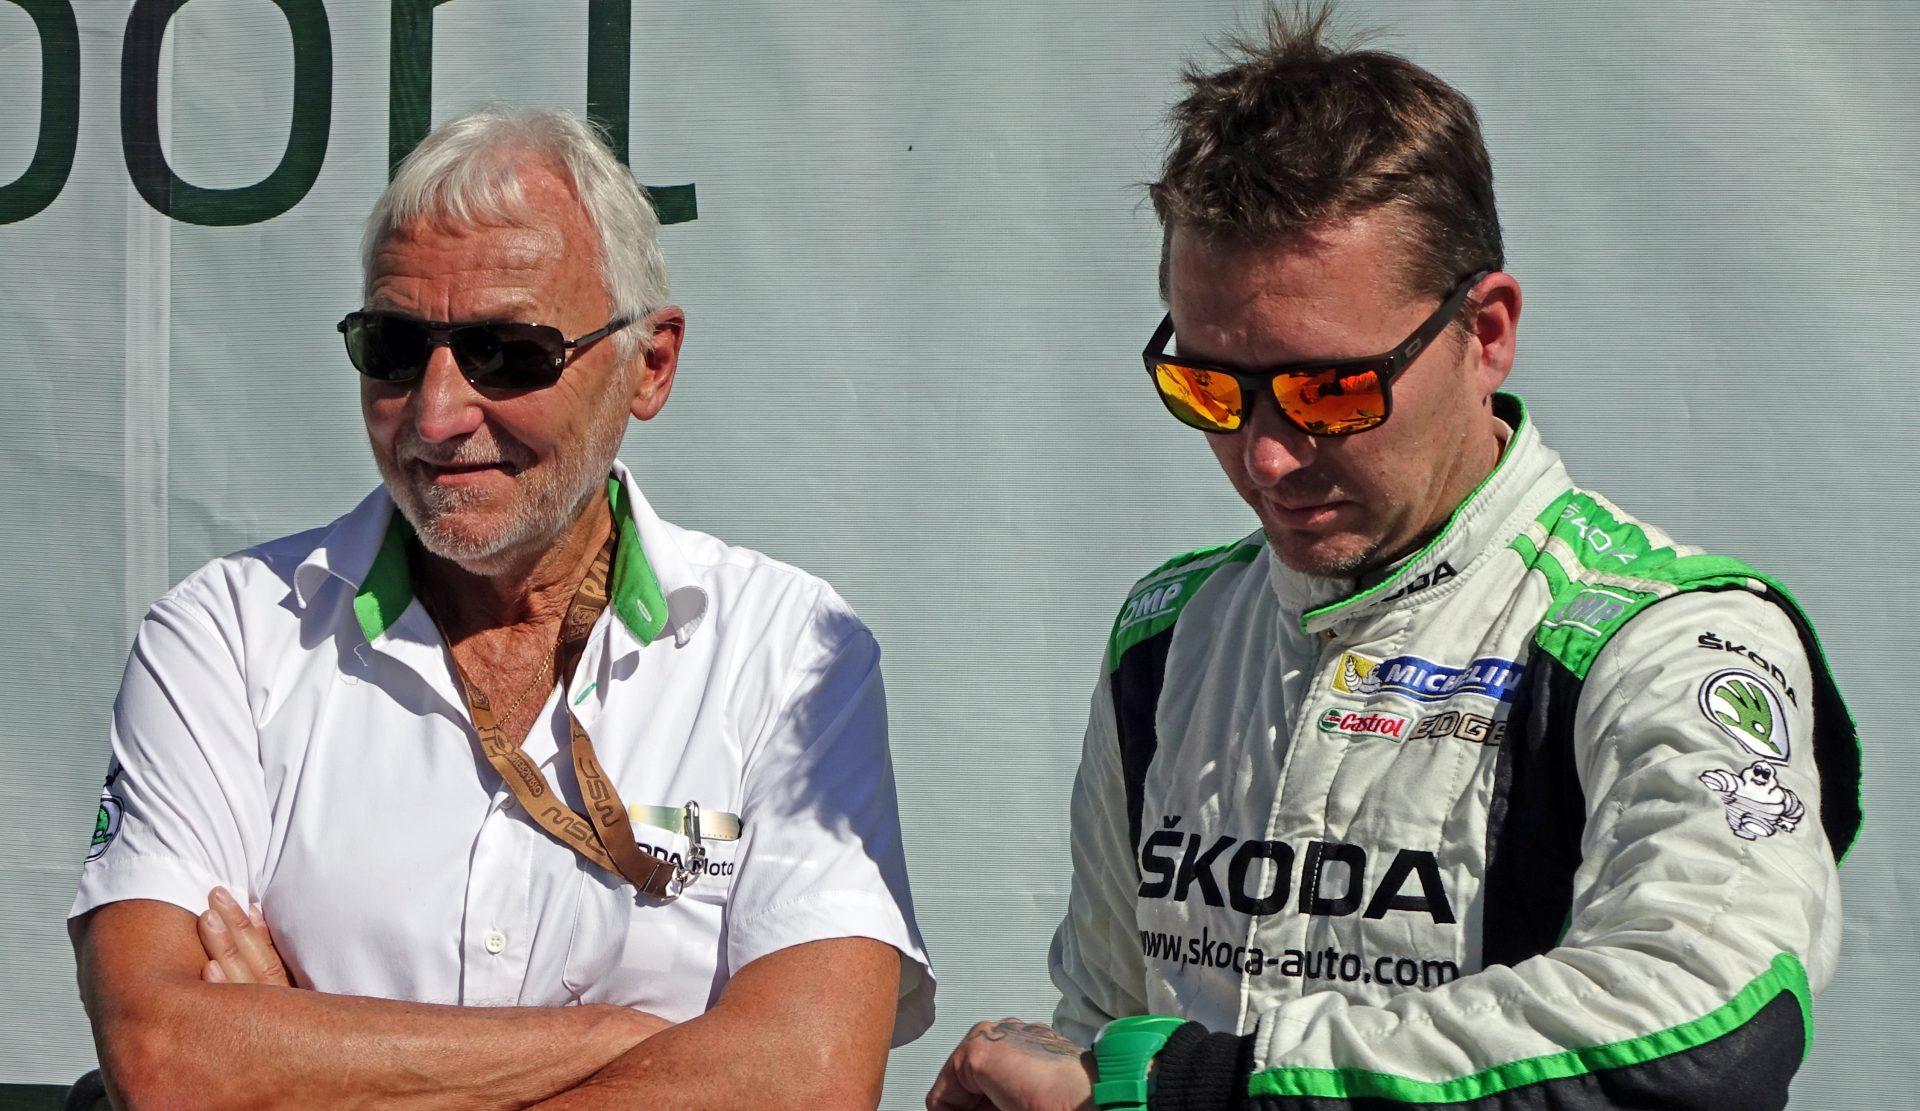 Co si týmový manažer Pavel Hortek myslí o turecké rallye?